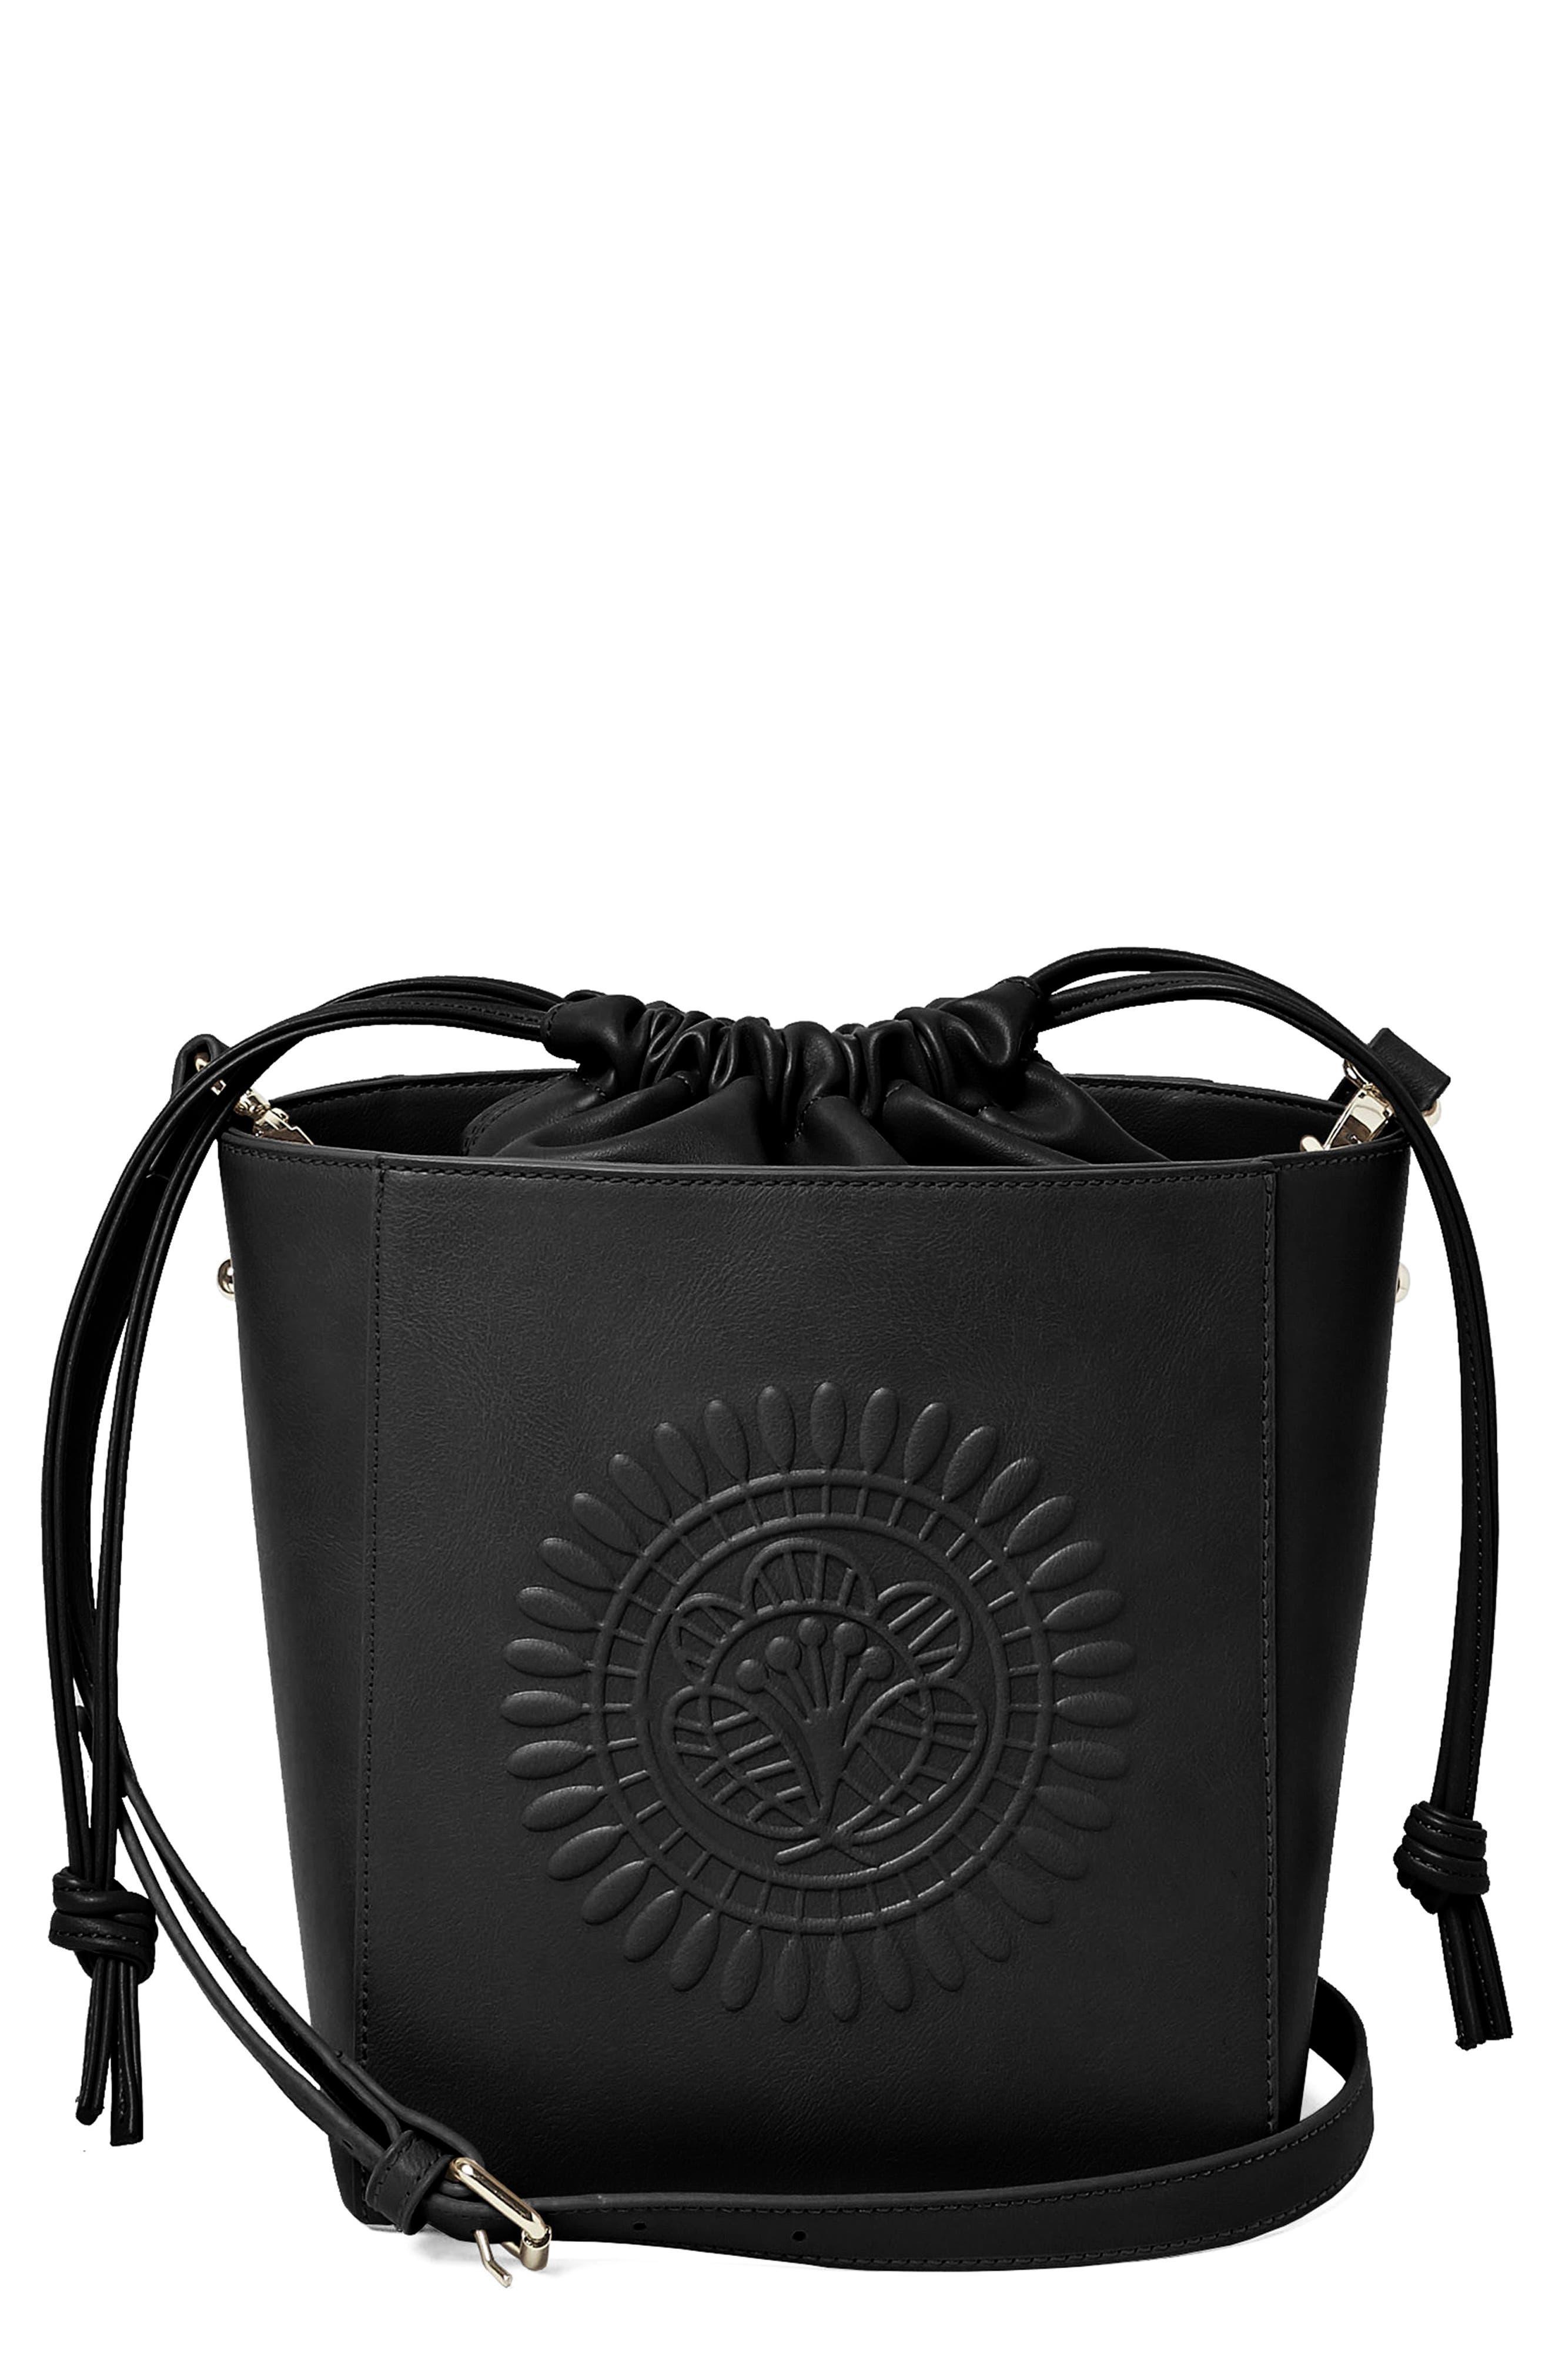 Wanderer Vegan Leather Bucket Bag,                             Main thumbnail 1, color,                             001